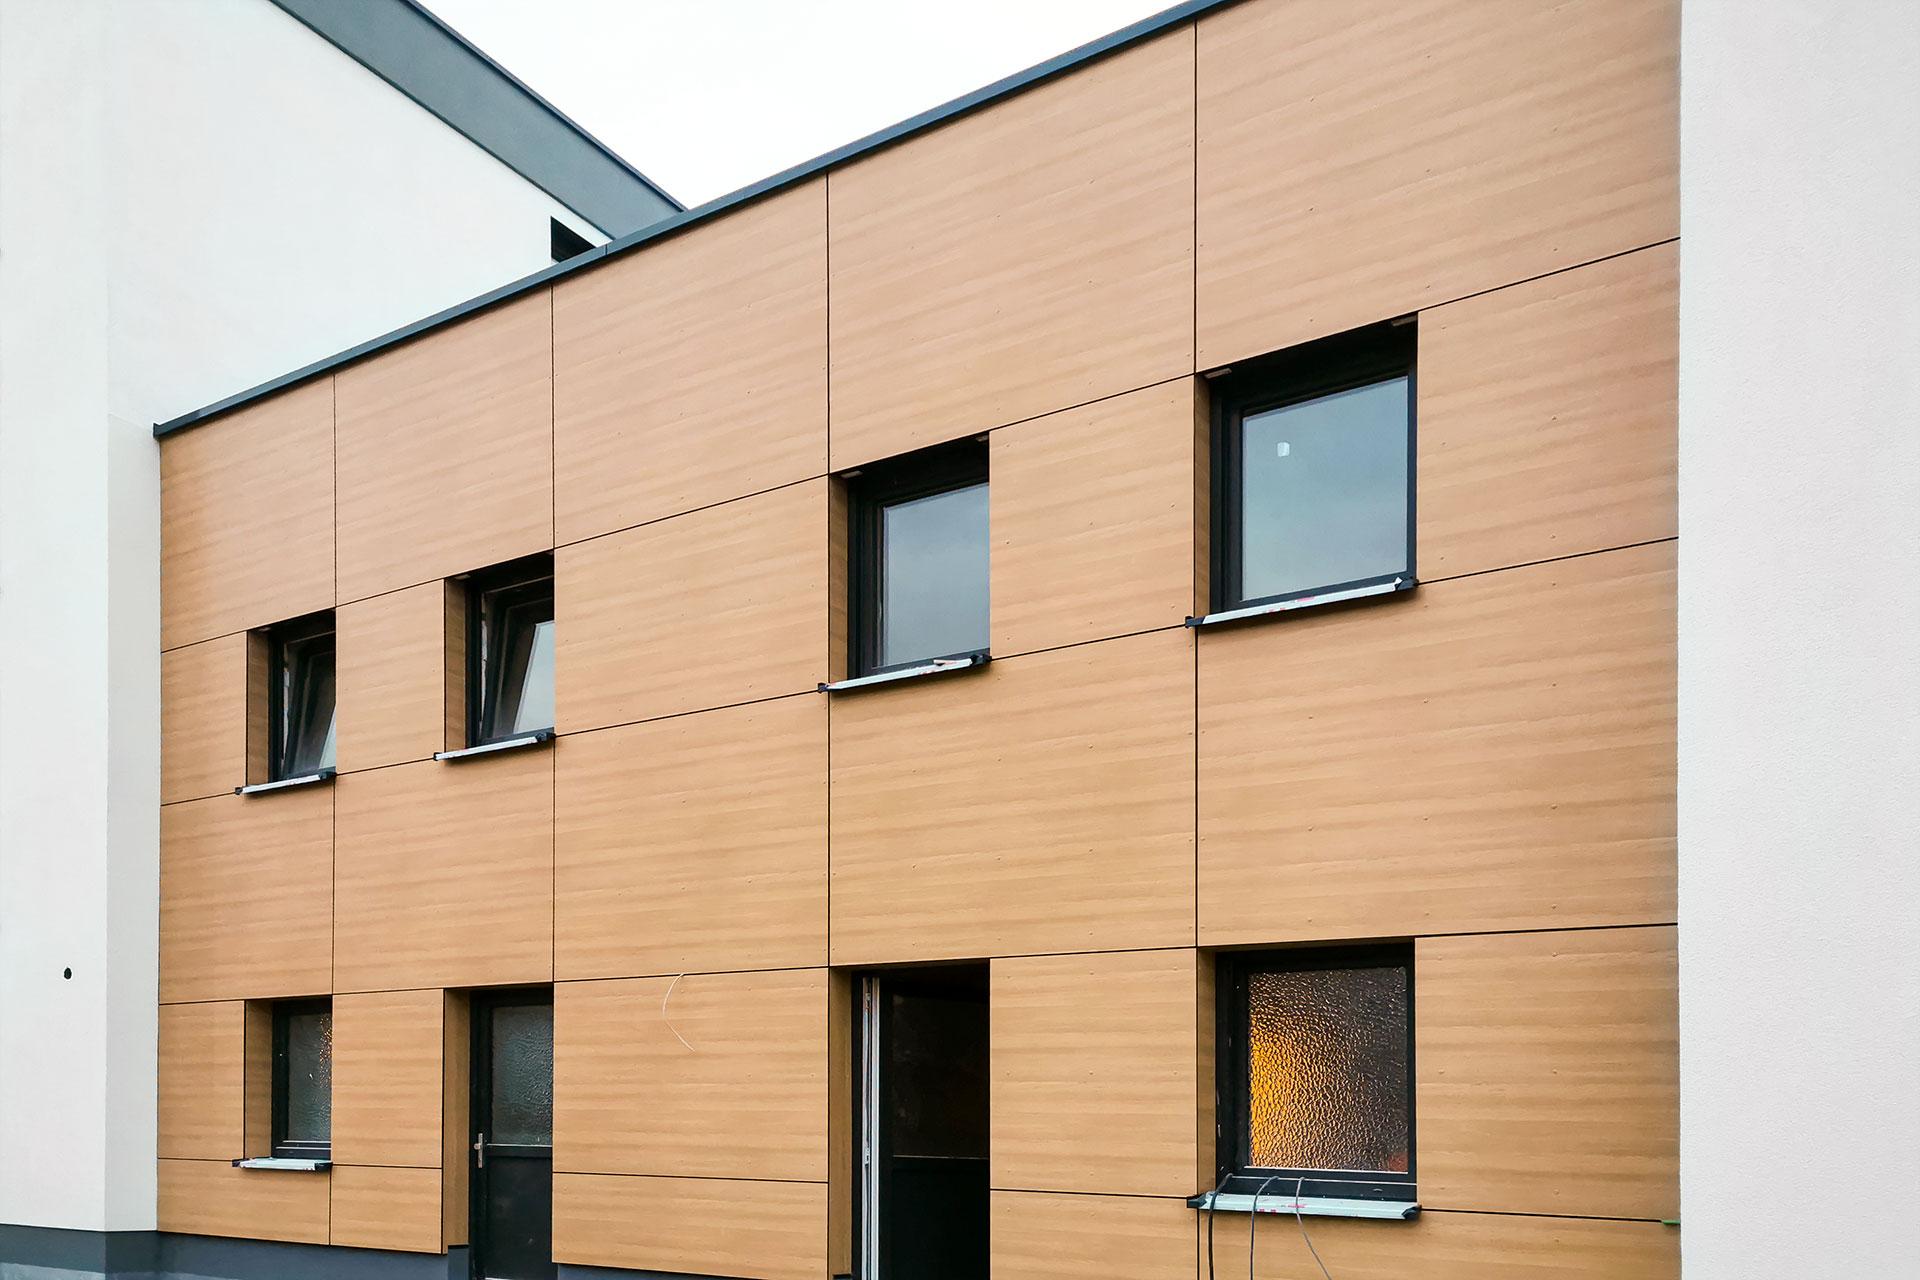 Projekte: Mehrfamilienhäuser in Borna (2020) - Neubau von 2 Mehrfamilienhäusern